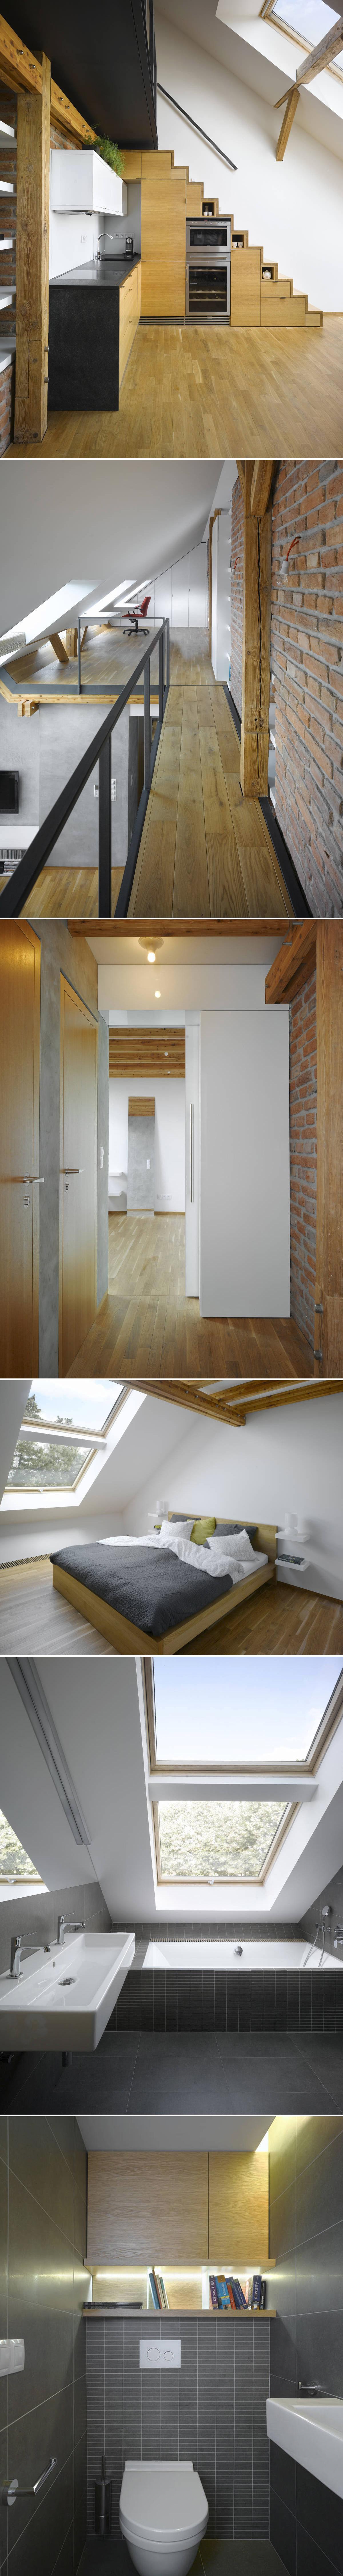 http://www.idesignarch.com/small-attic-loft-apartment-in-prague/